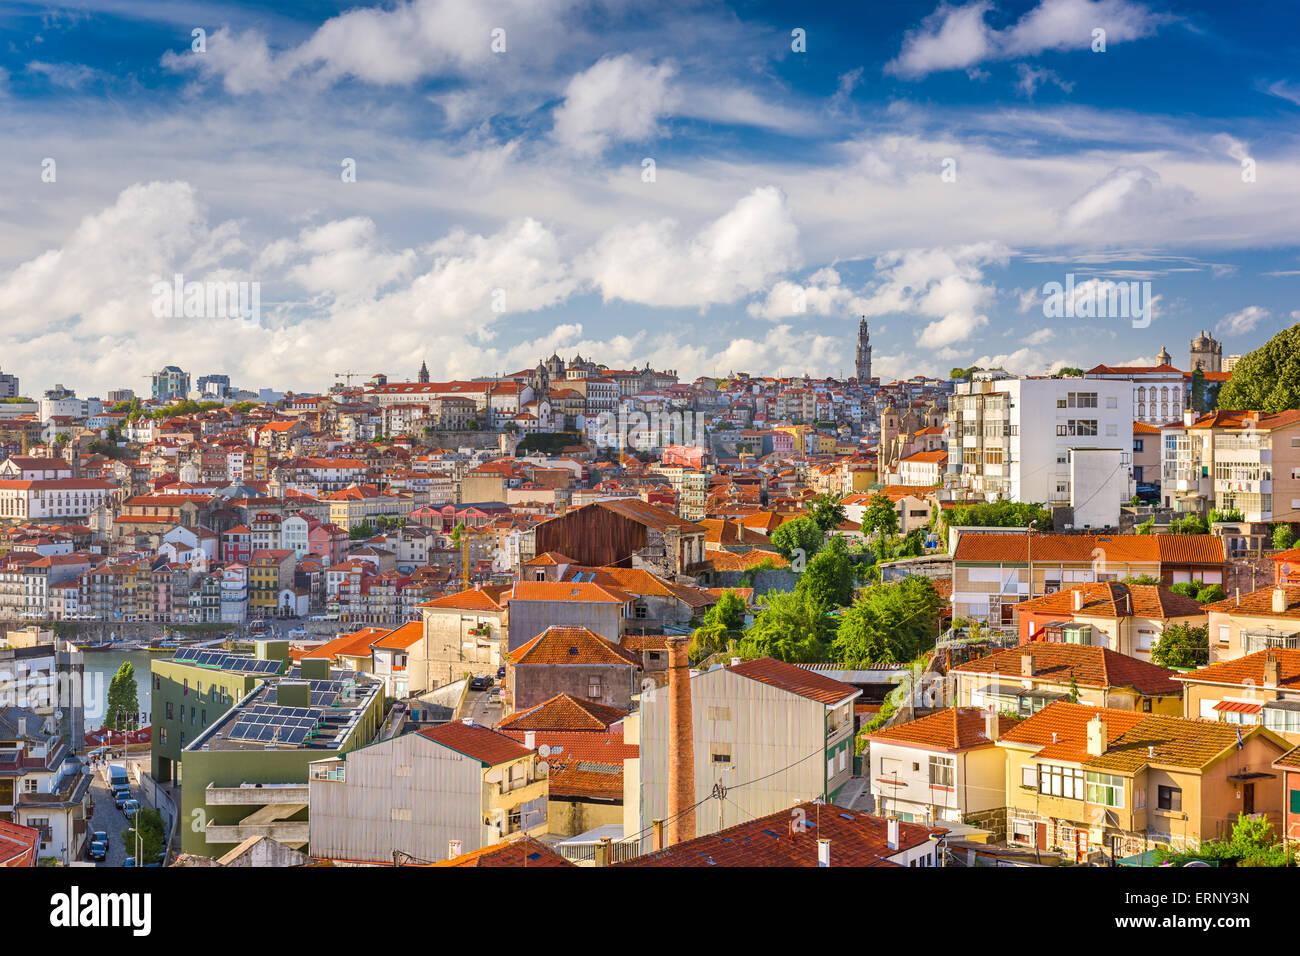 Porto, Portugal Stadtbild von Vila Noval de Gaia. Stockbild